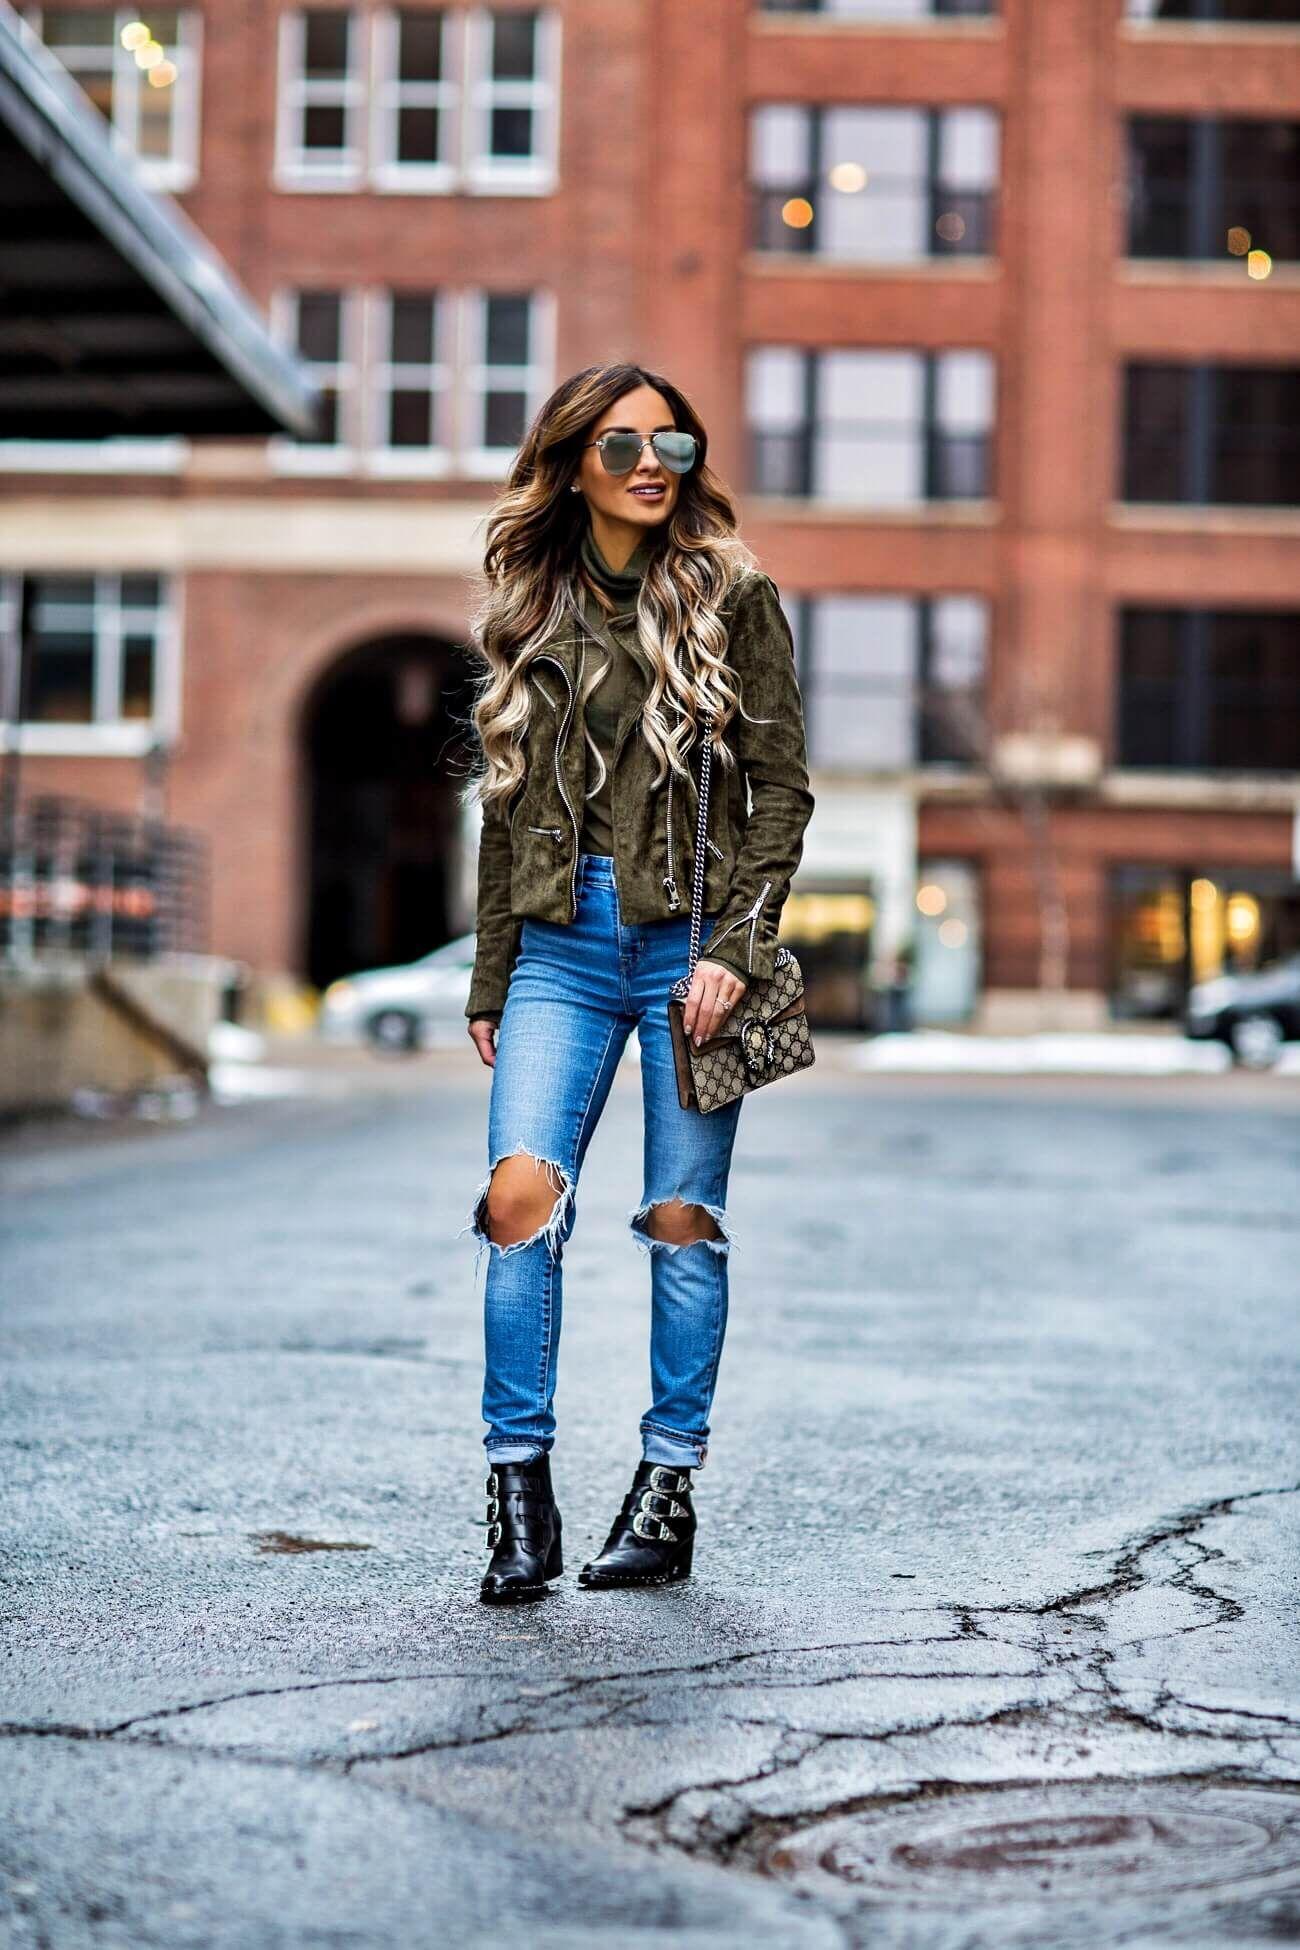 75513d099c9 A fashion, beauty   lifestyle blog written by Minneapolis based Maria  Vizuete.